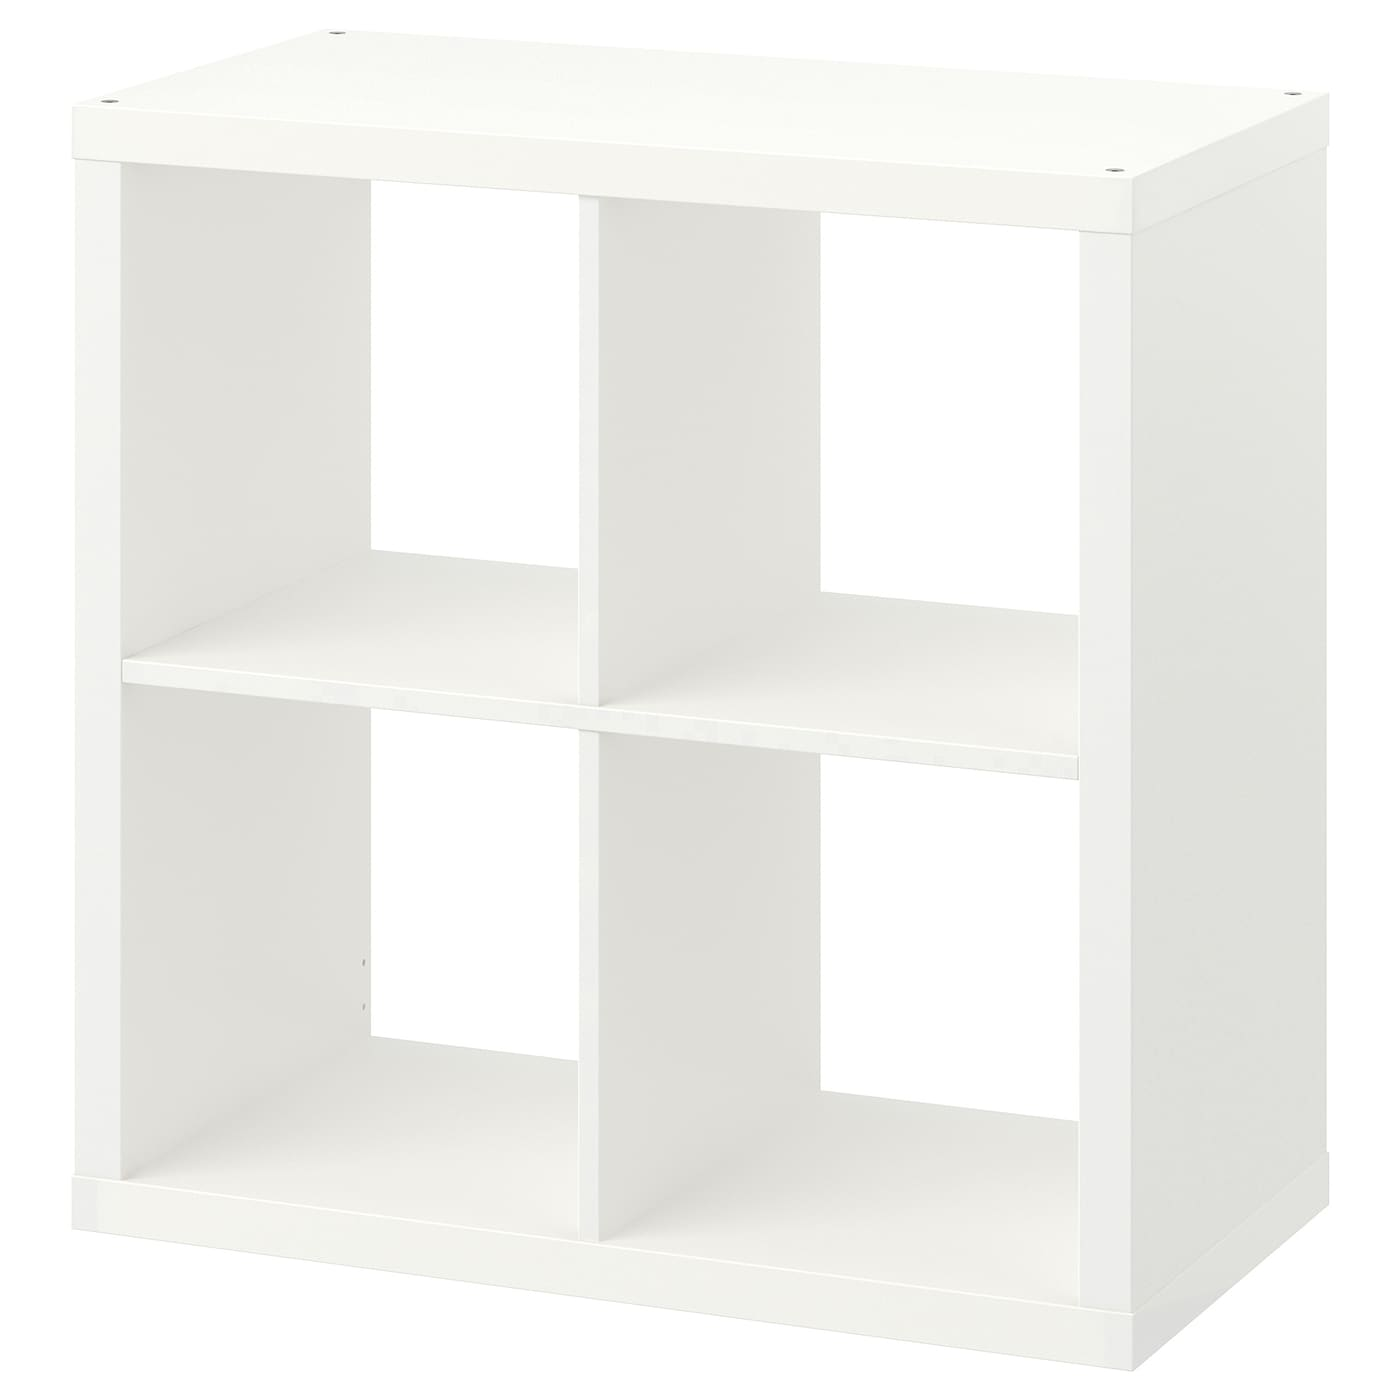 kallax tag re blanc 77 x 77 cm ikea. Black Bedroom Furniture Sets. Home Design Ideas